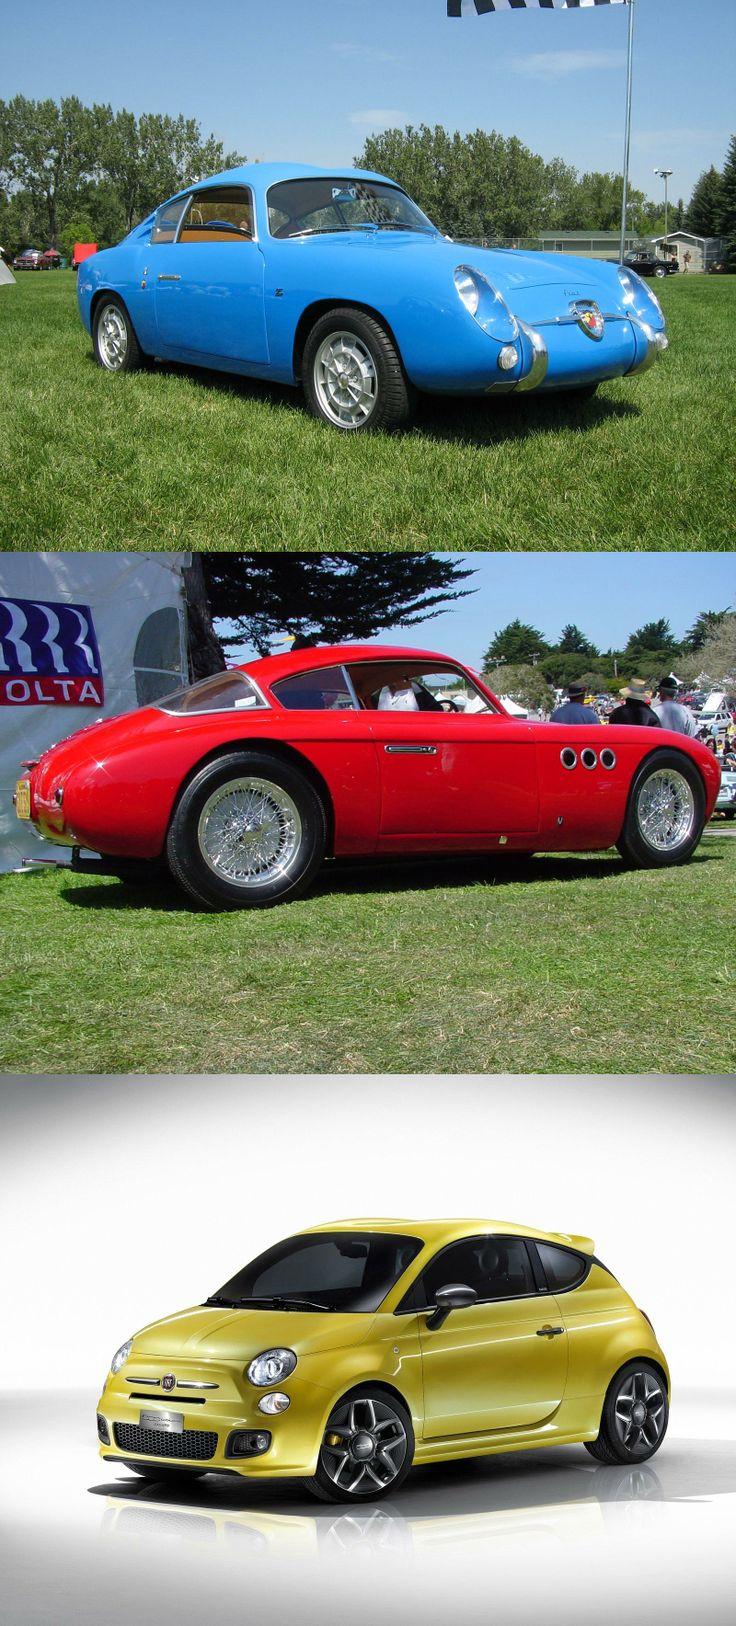 Fiat abarth 750 gt zagato 1959 fiat abarthhtml